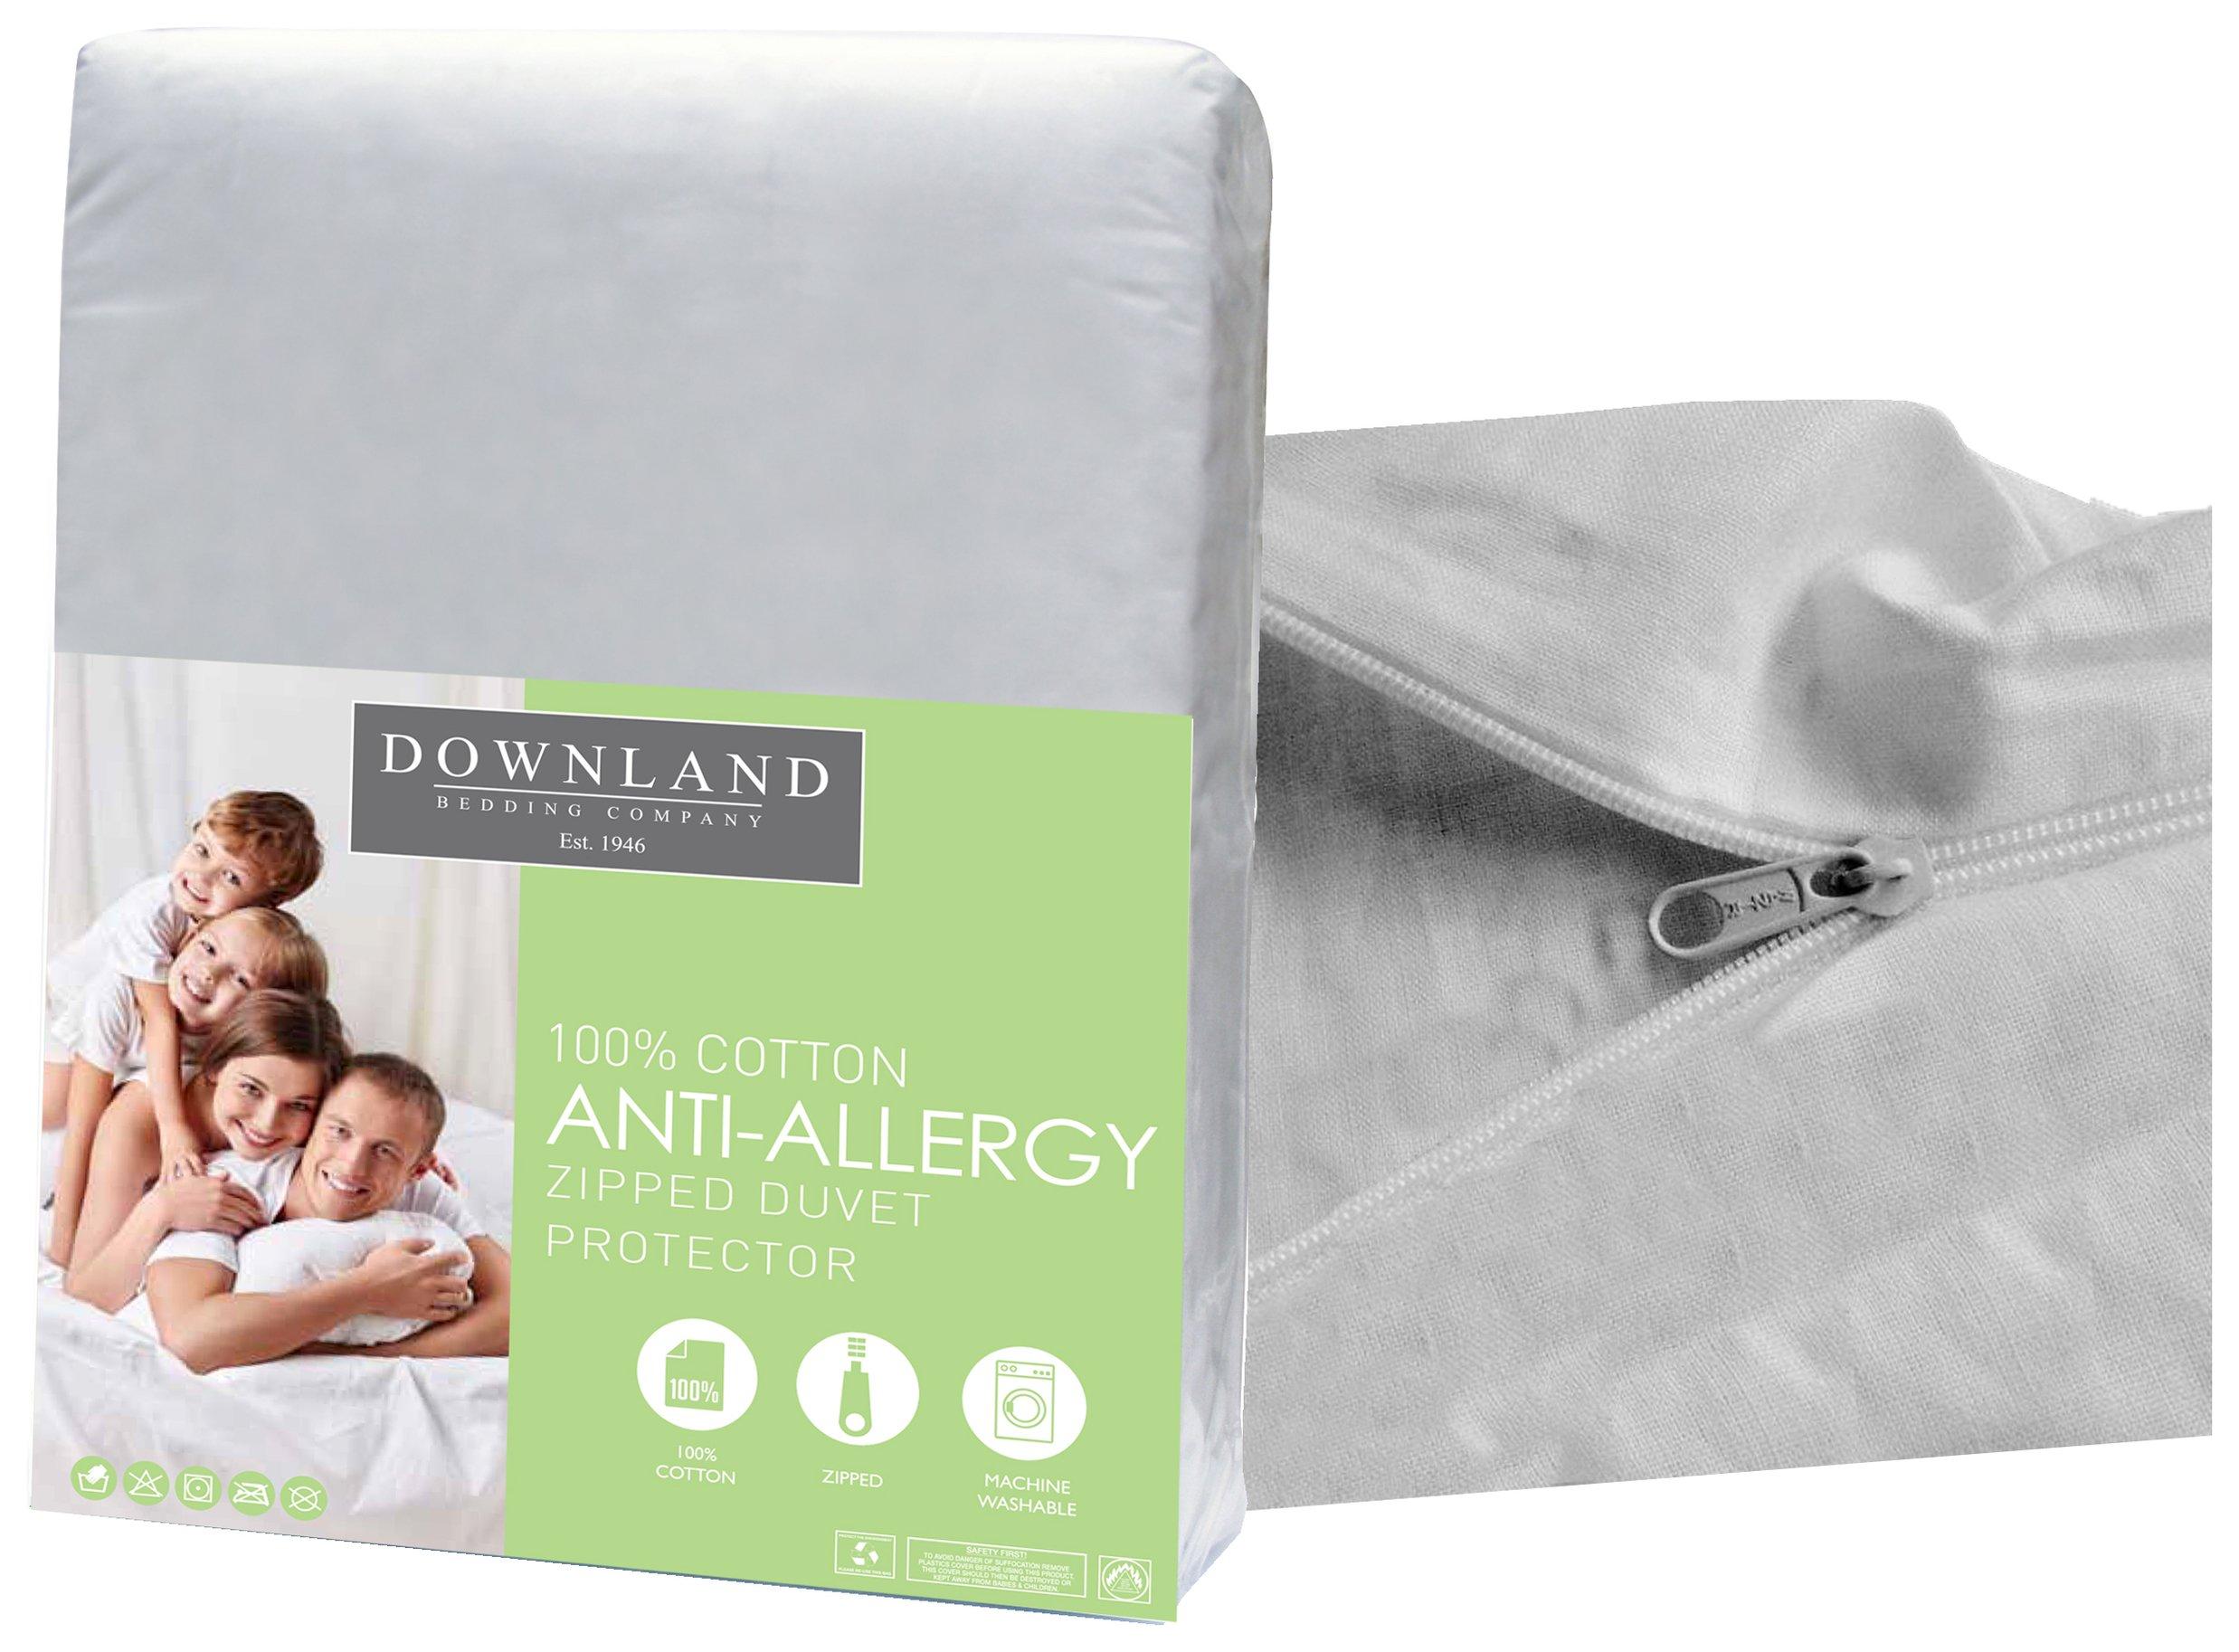 downland zipped anti allergy duvet protector  king